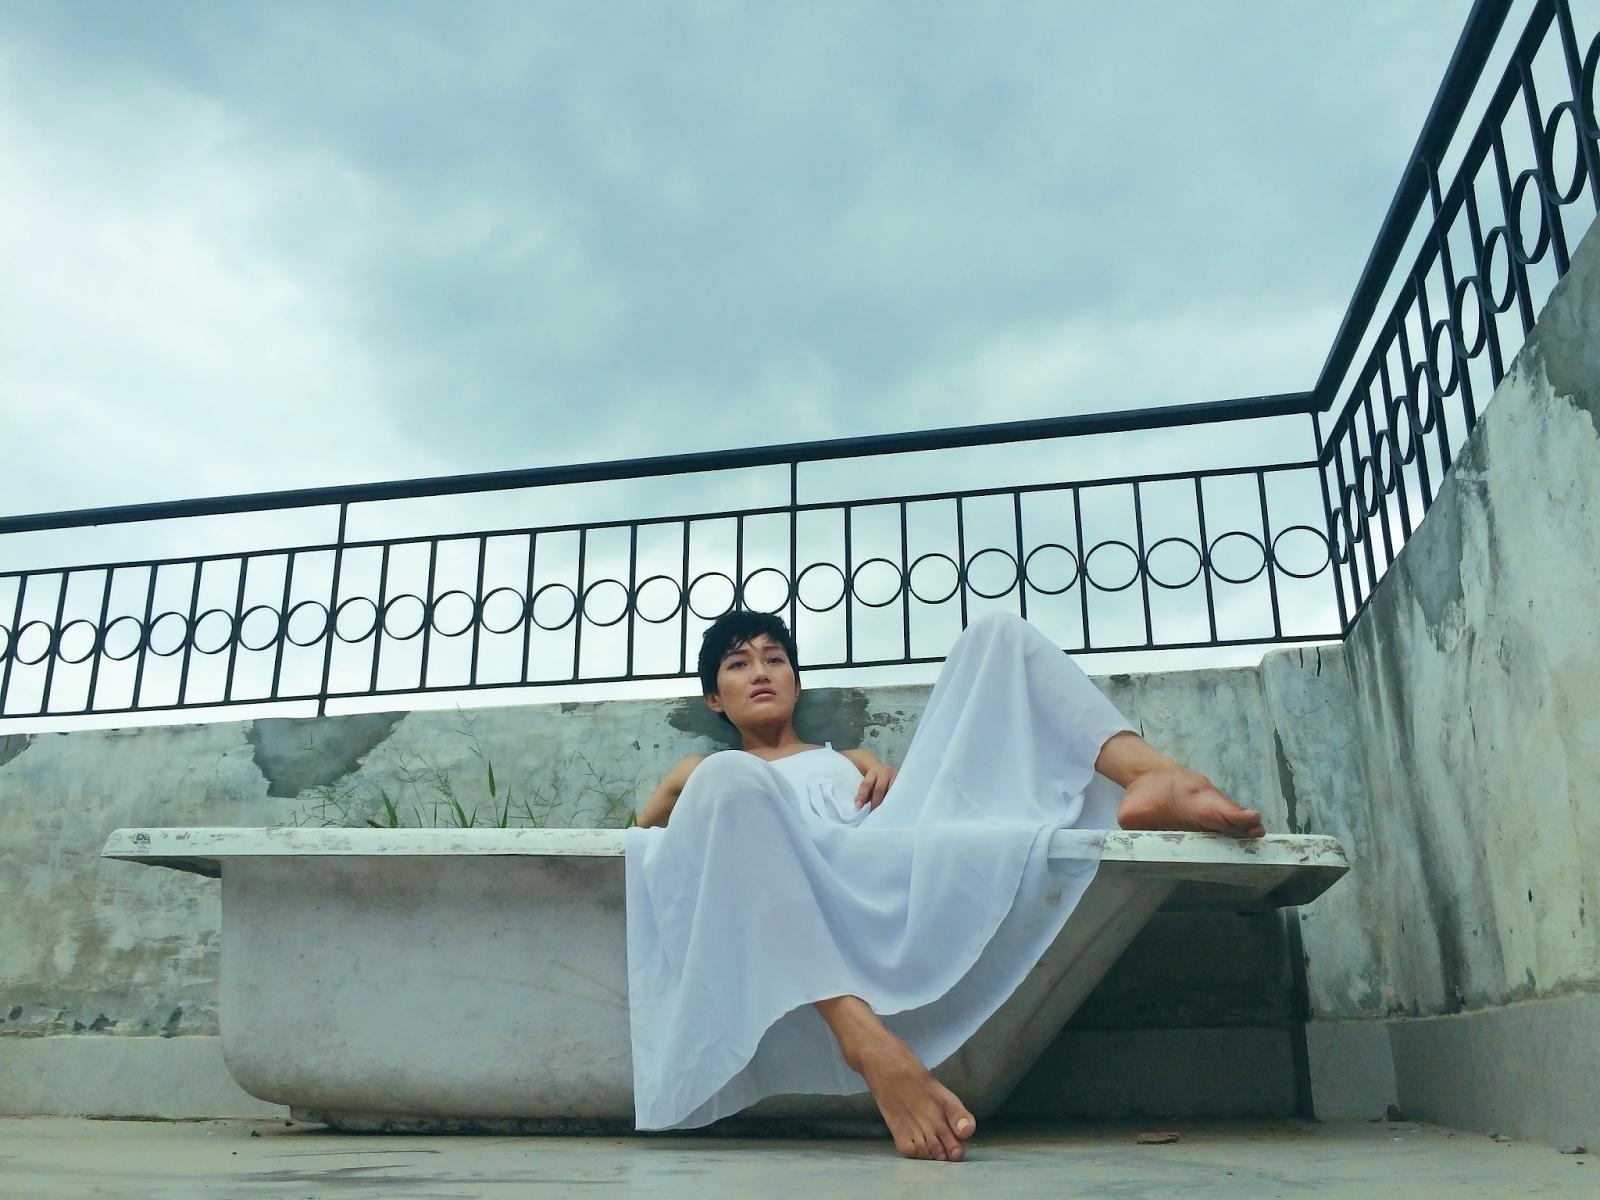 iPhone Photography, aienjamir, fashion & I, fashion blogger, less is more, bathtub, indian blogger